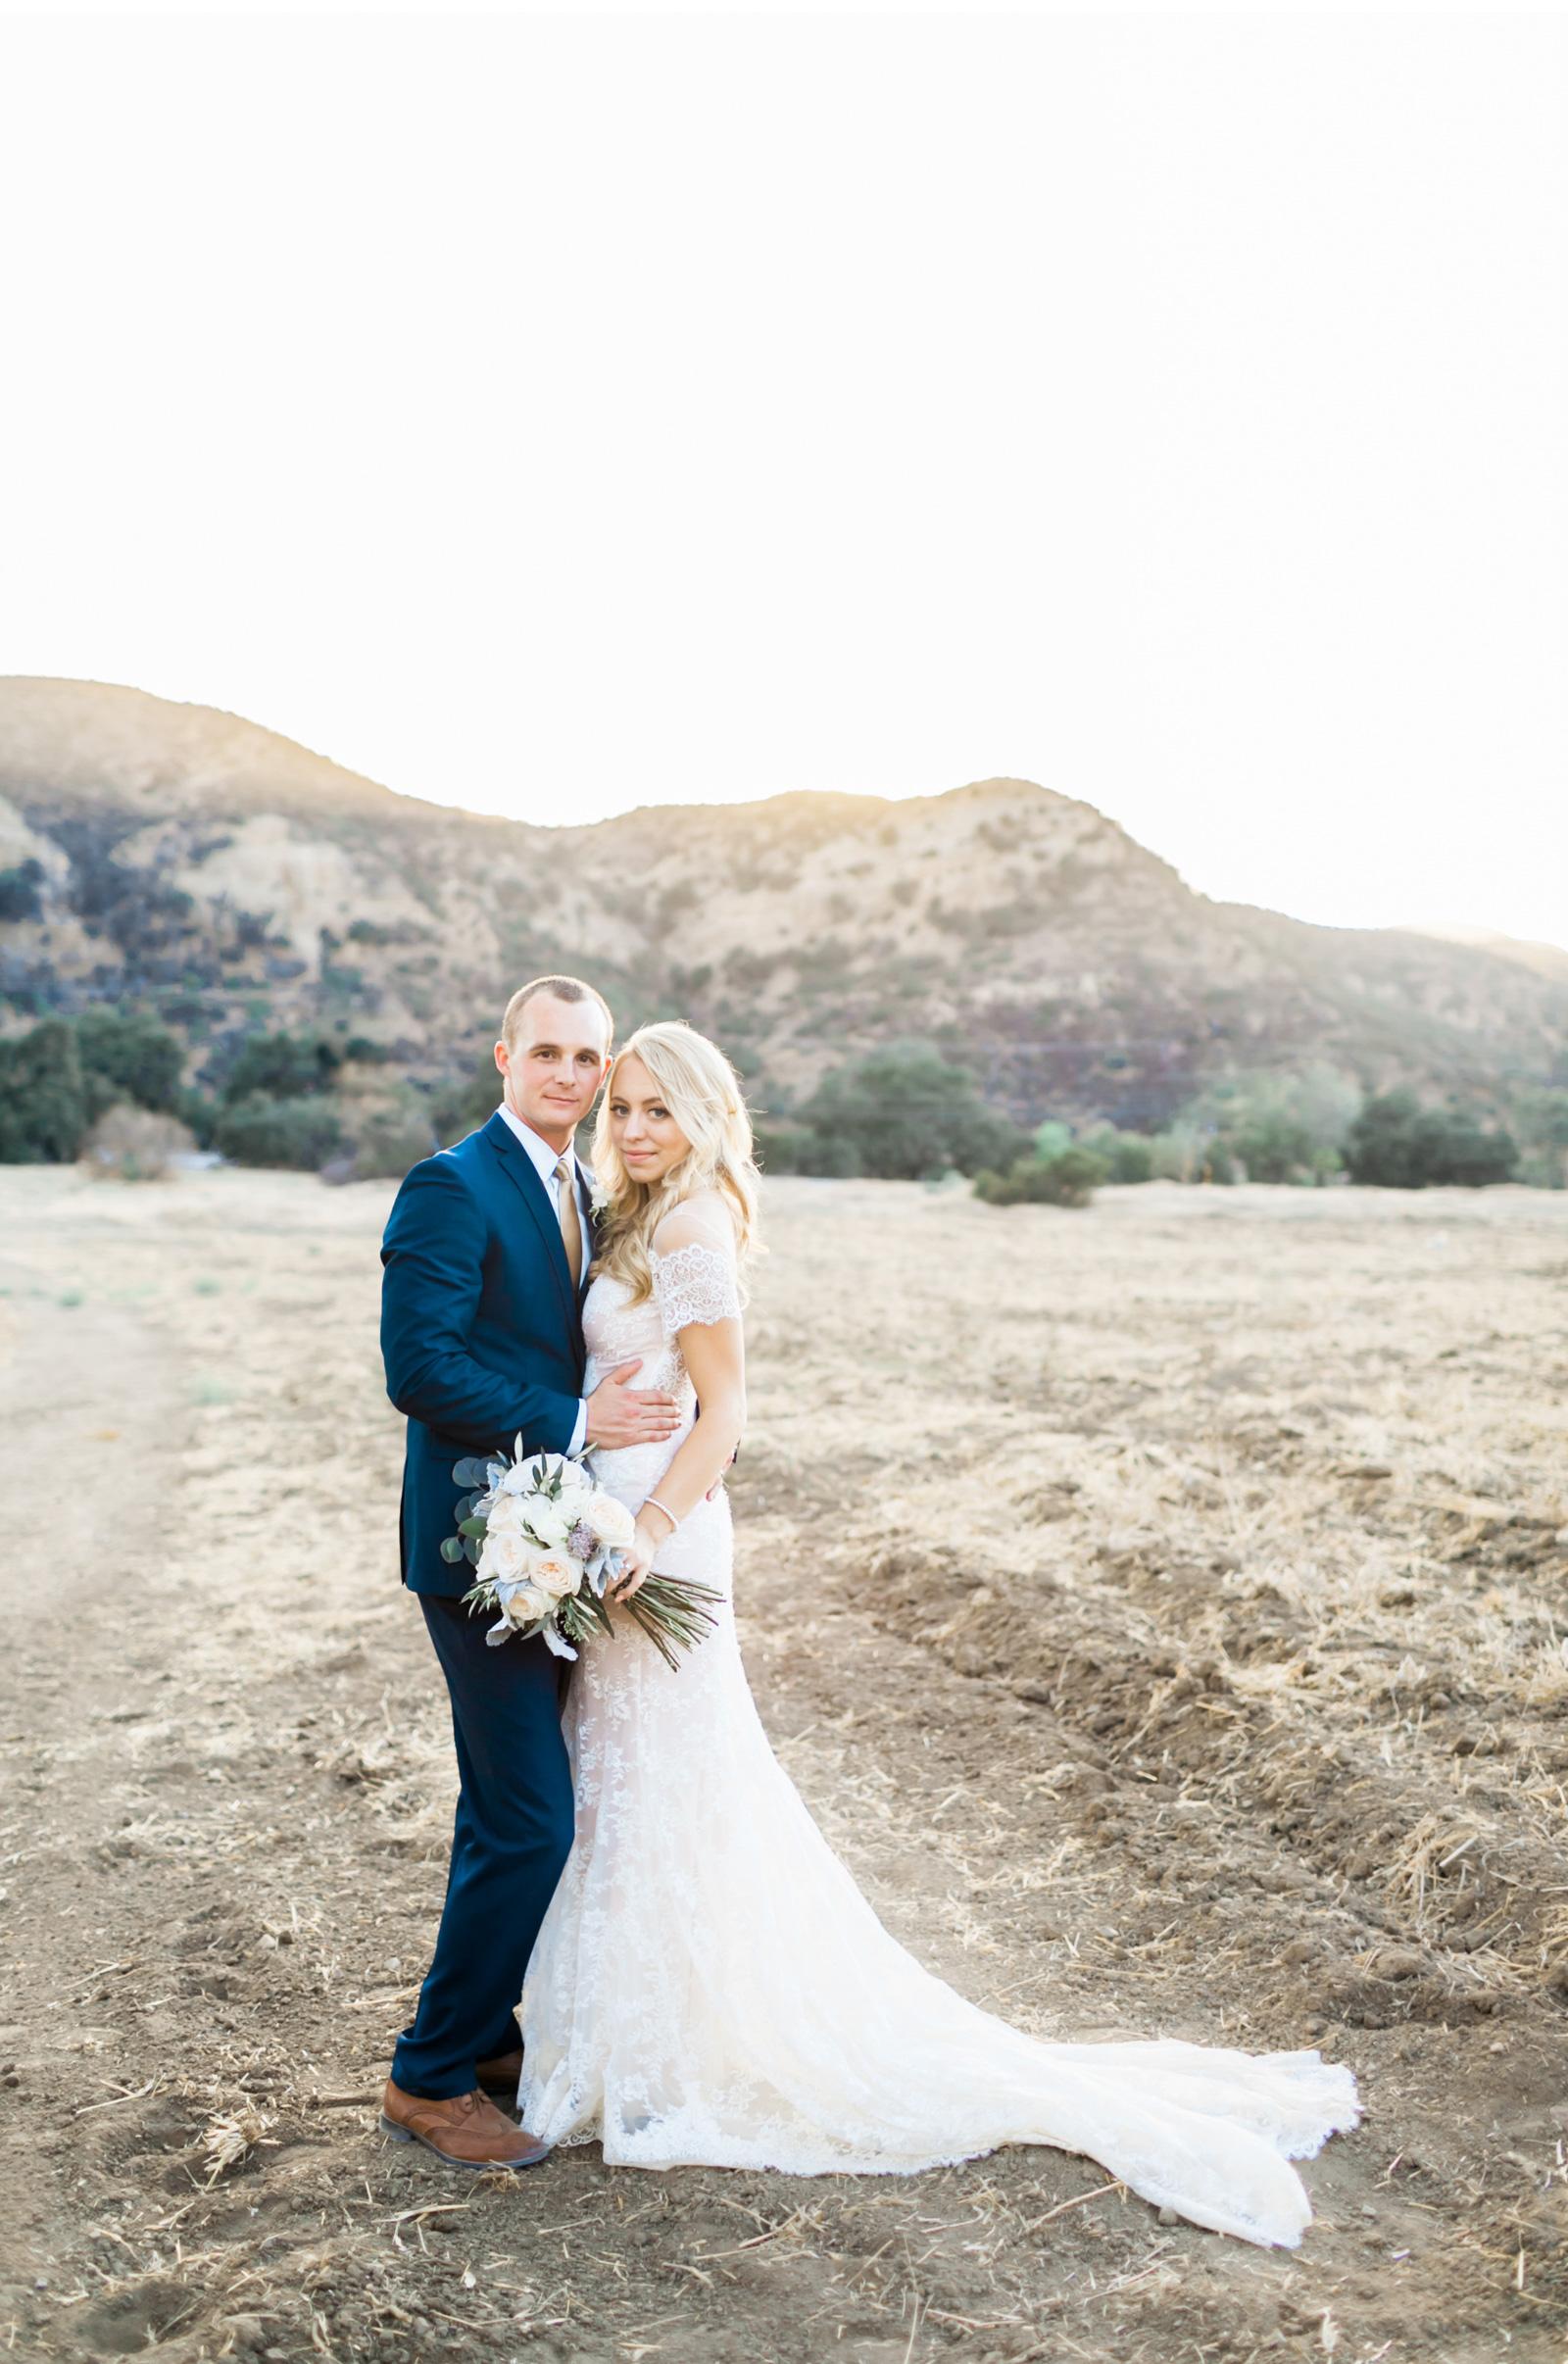 California-Wedding-Photographer-Style-Me-Pretty-Natalie-Schutt-San-Luis-Obispo_01.jpg